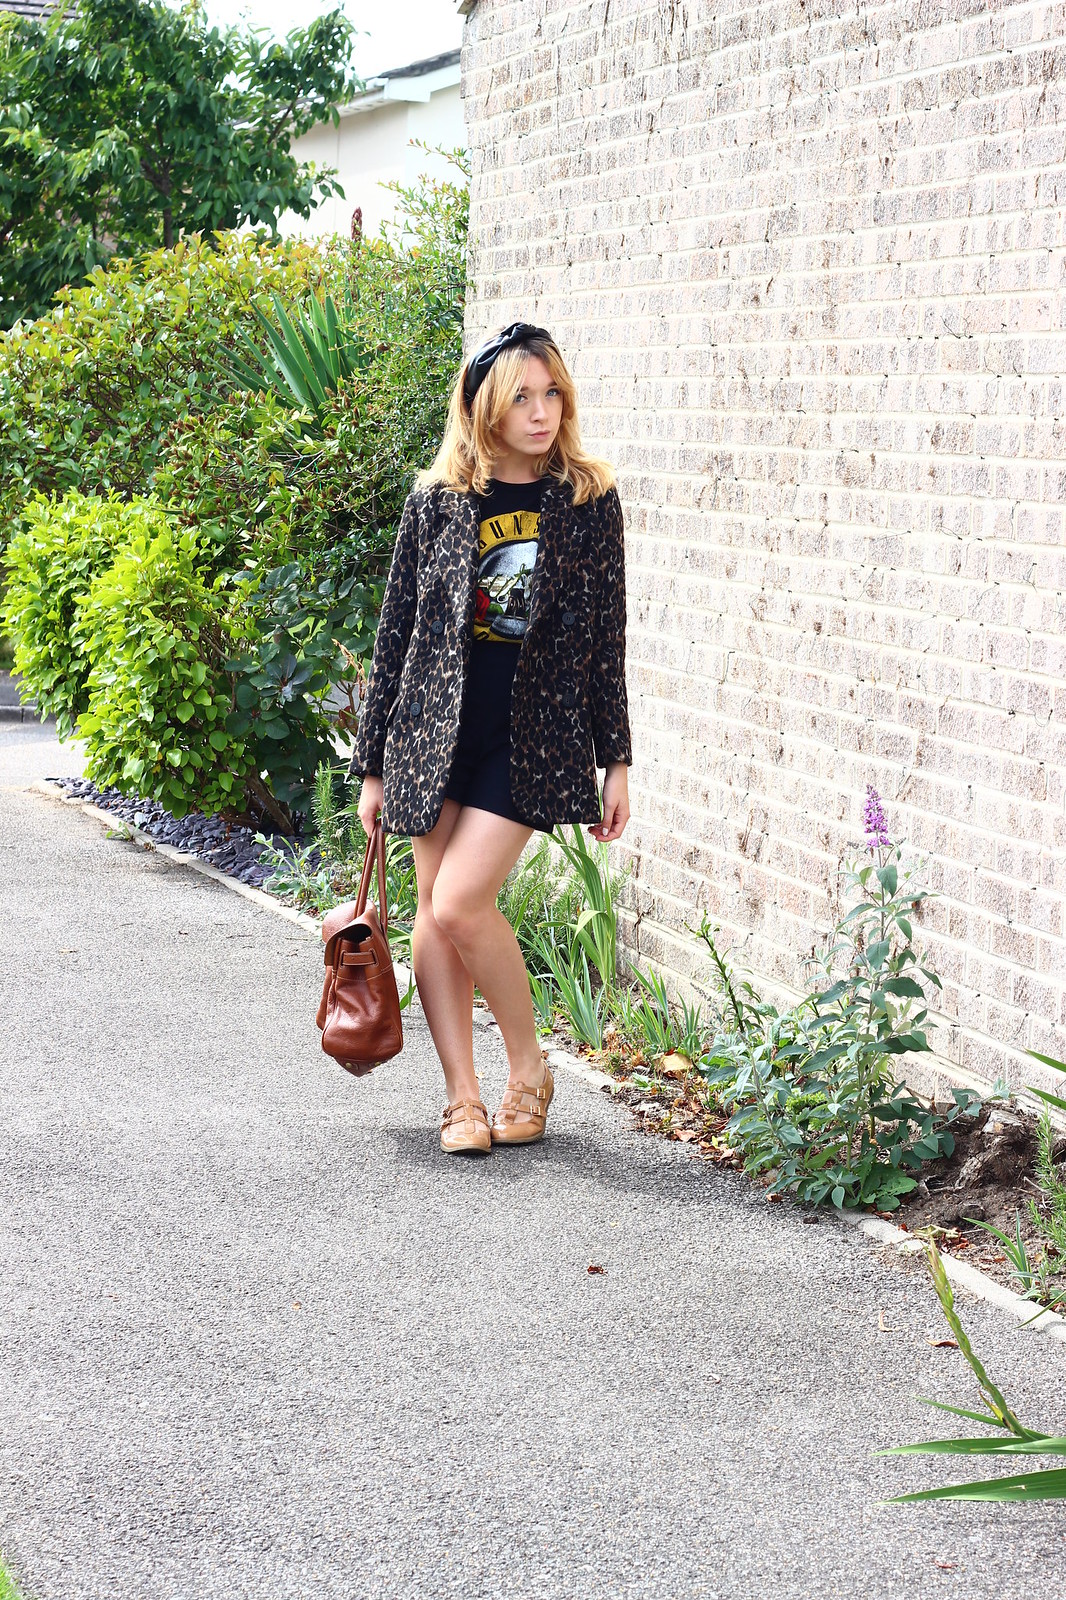 2leopardprintjacket, leopard print jacket h&m, outfit, retro, style